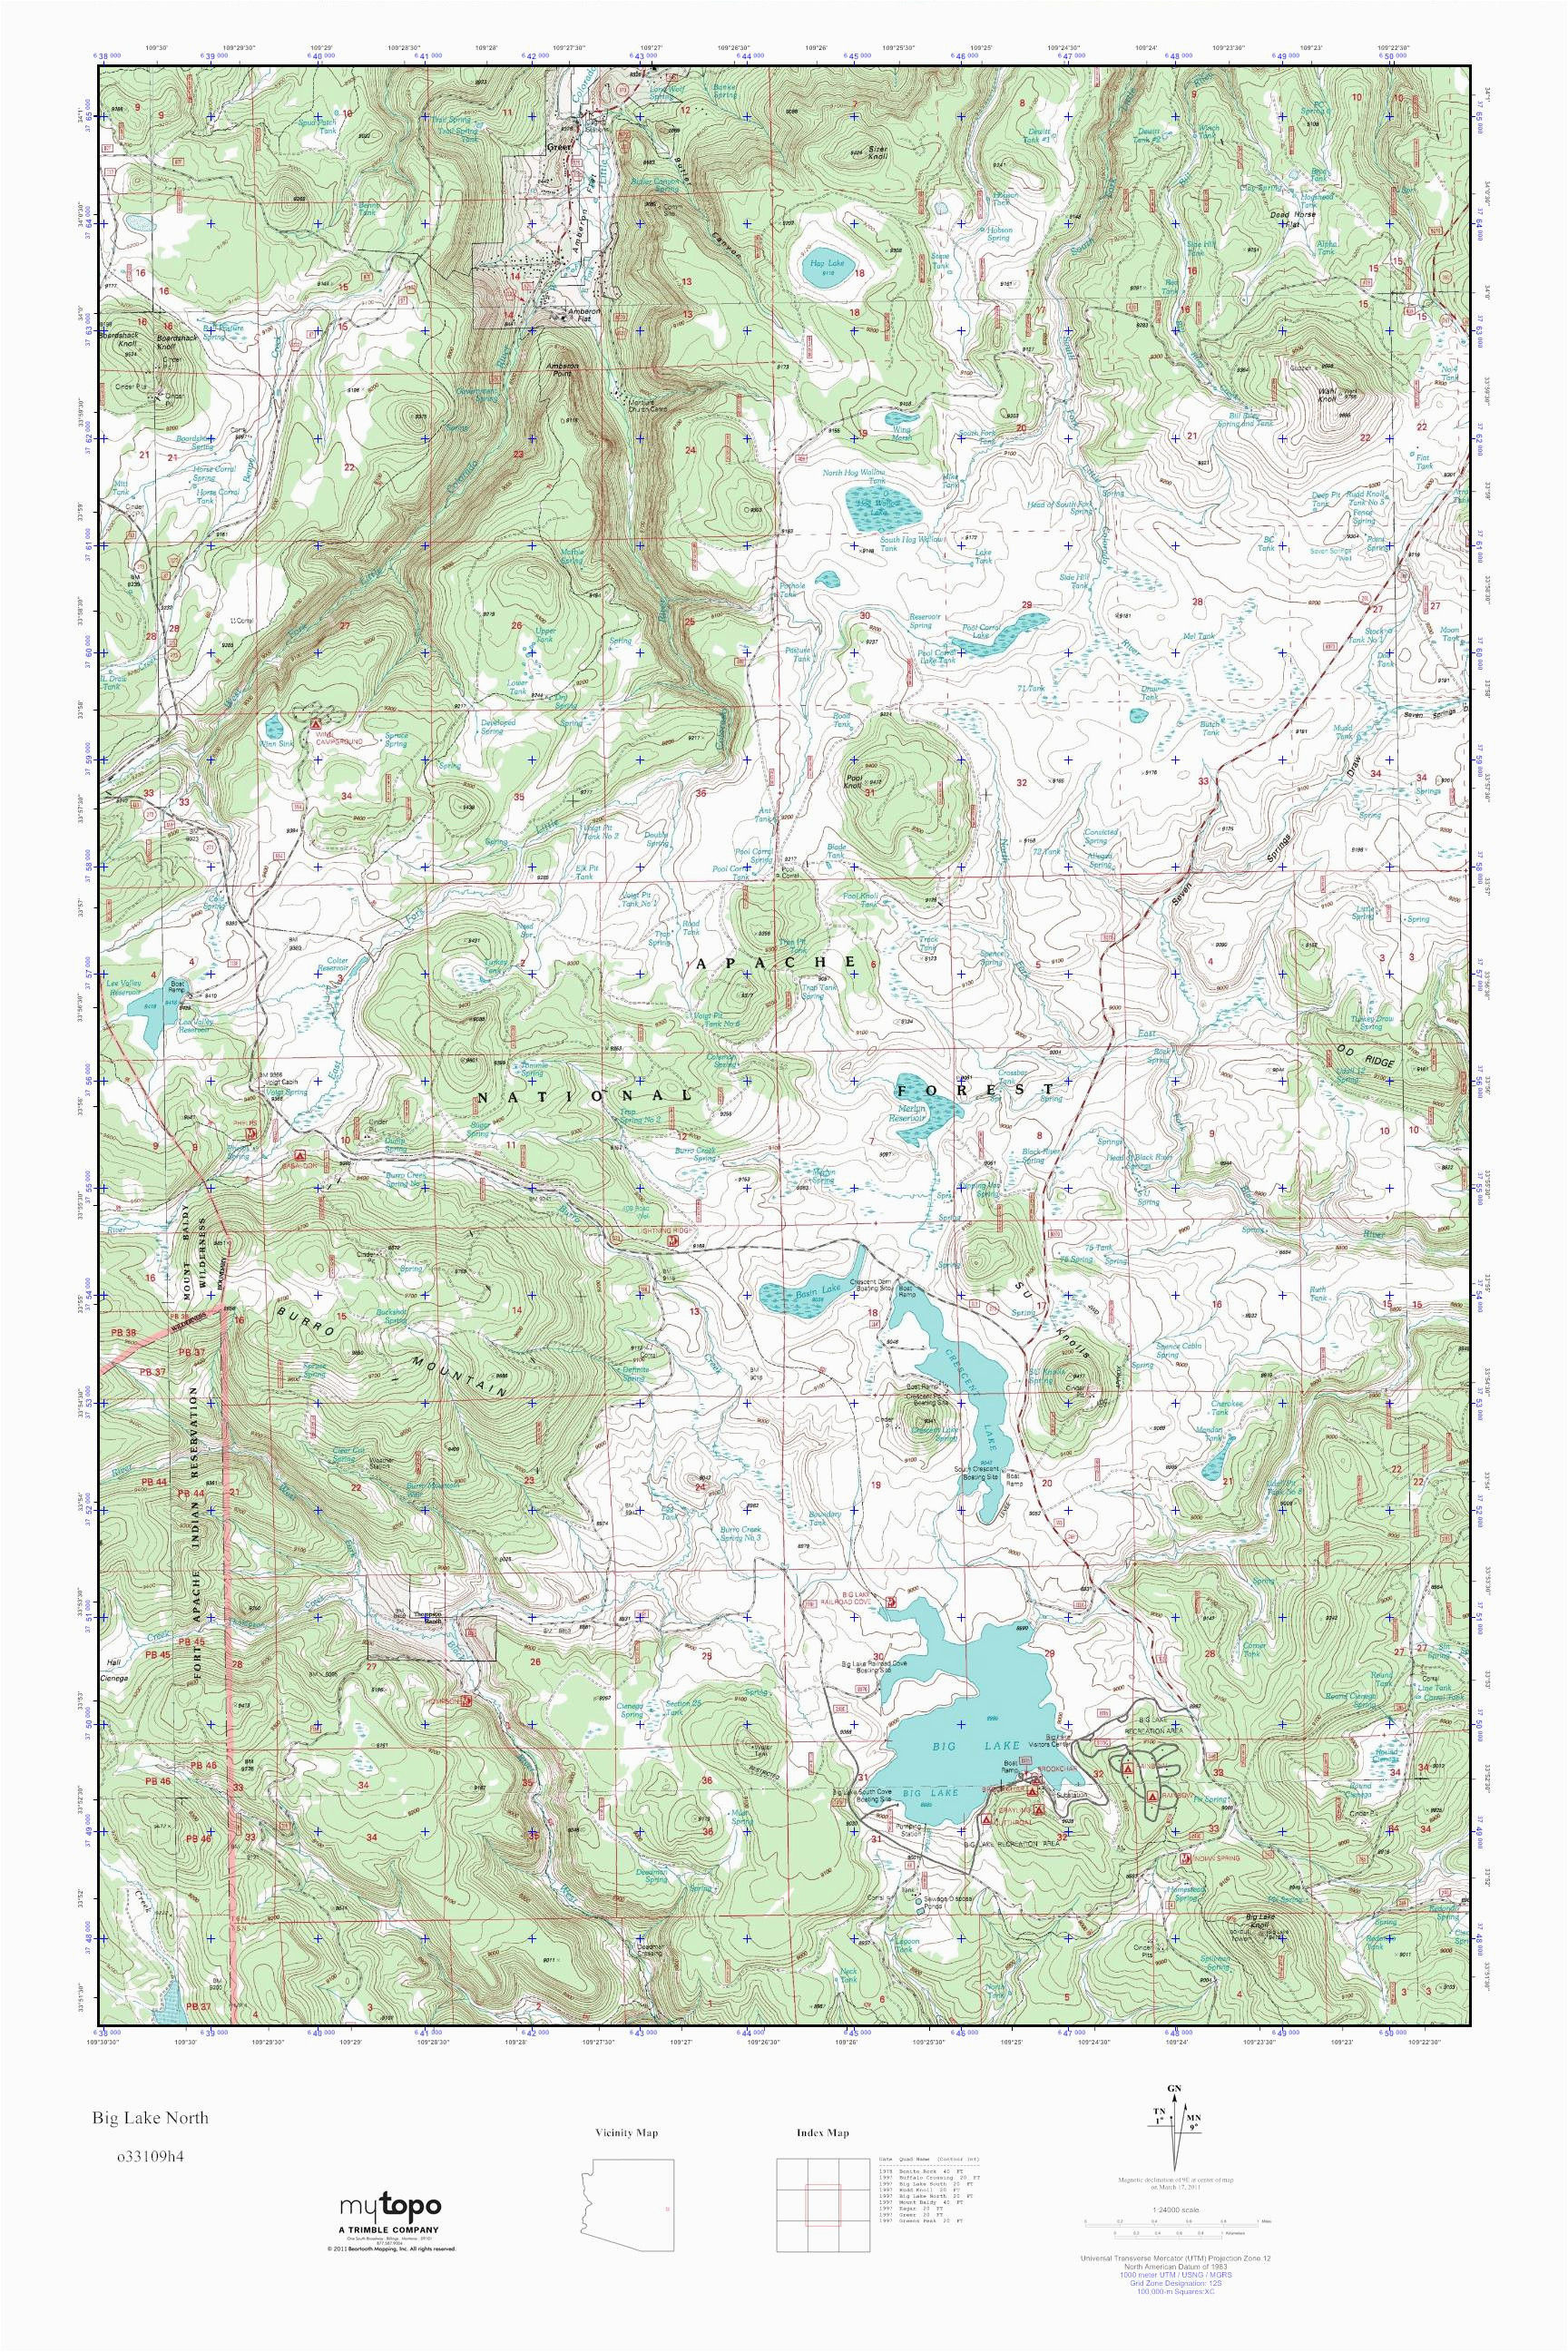 Topo Map Of Arizona Mytopo Big Lake north Arizona Usgs Quad topo Map